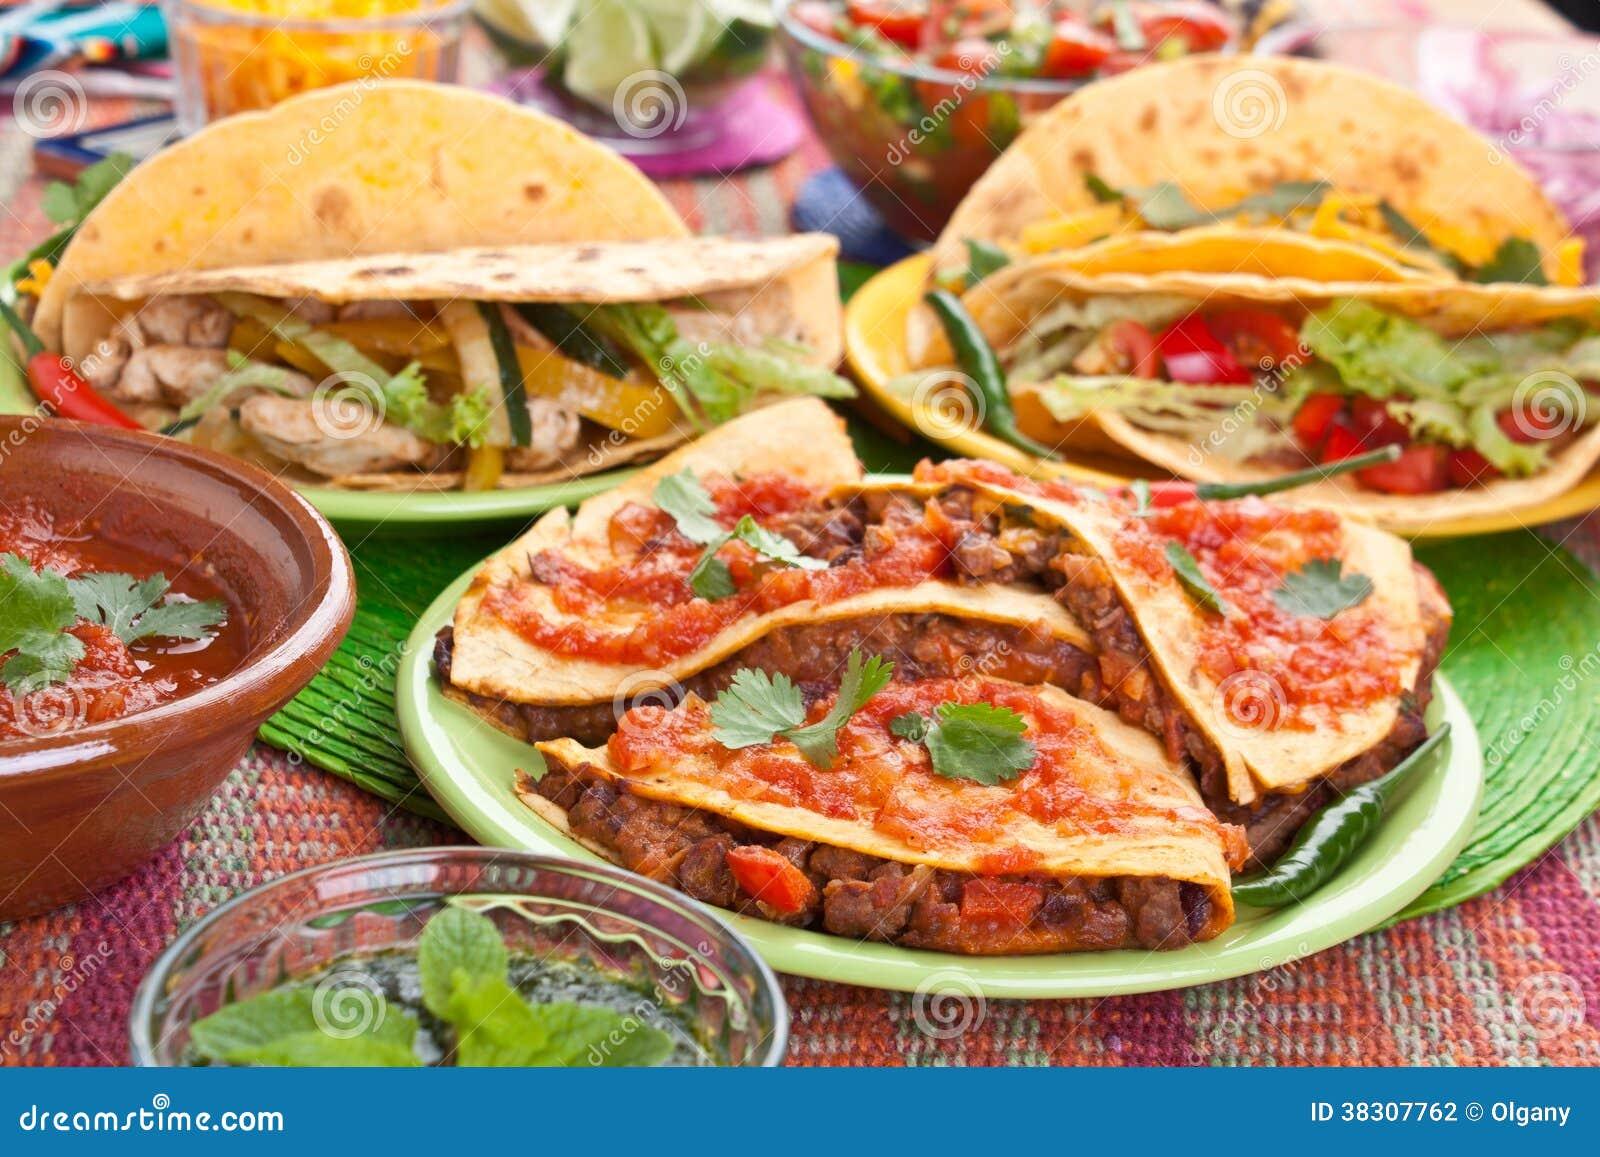 Nourriture mexicaine traditionnelle photo stock image du d ner color 38307762 - Cuisine mexicaine traditionnelle ...